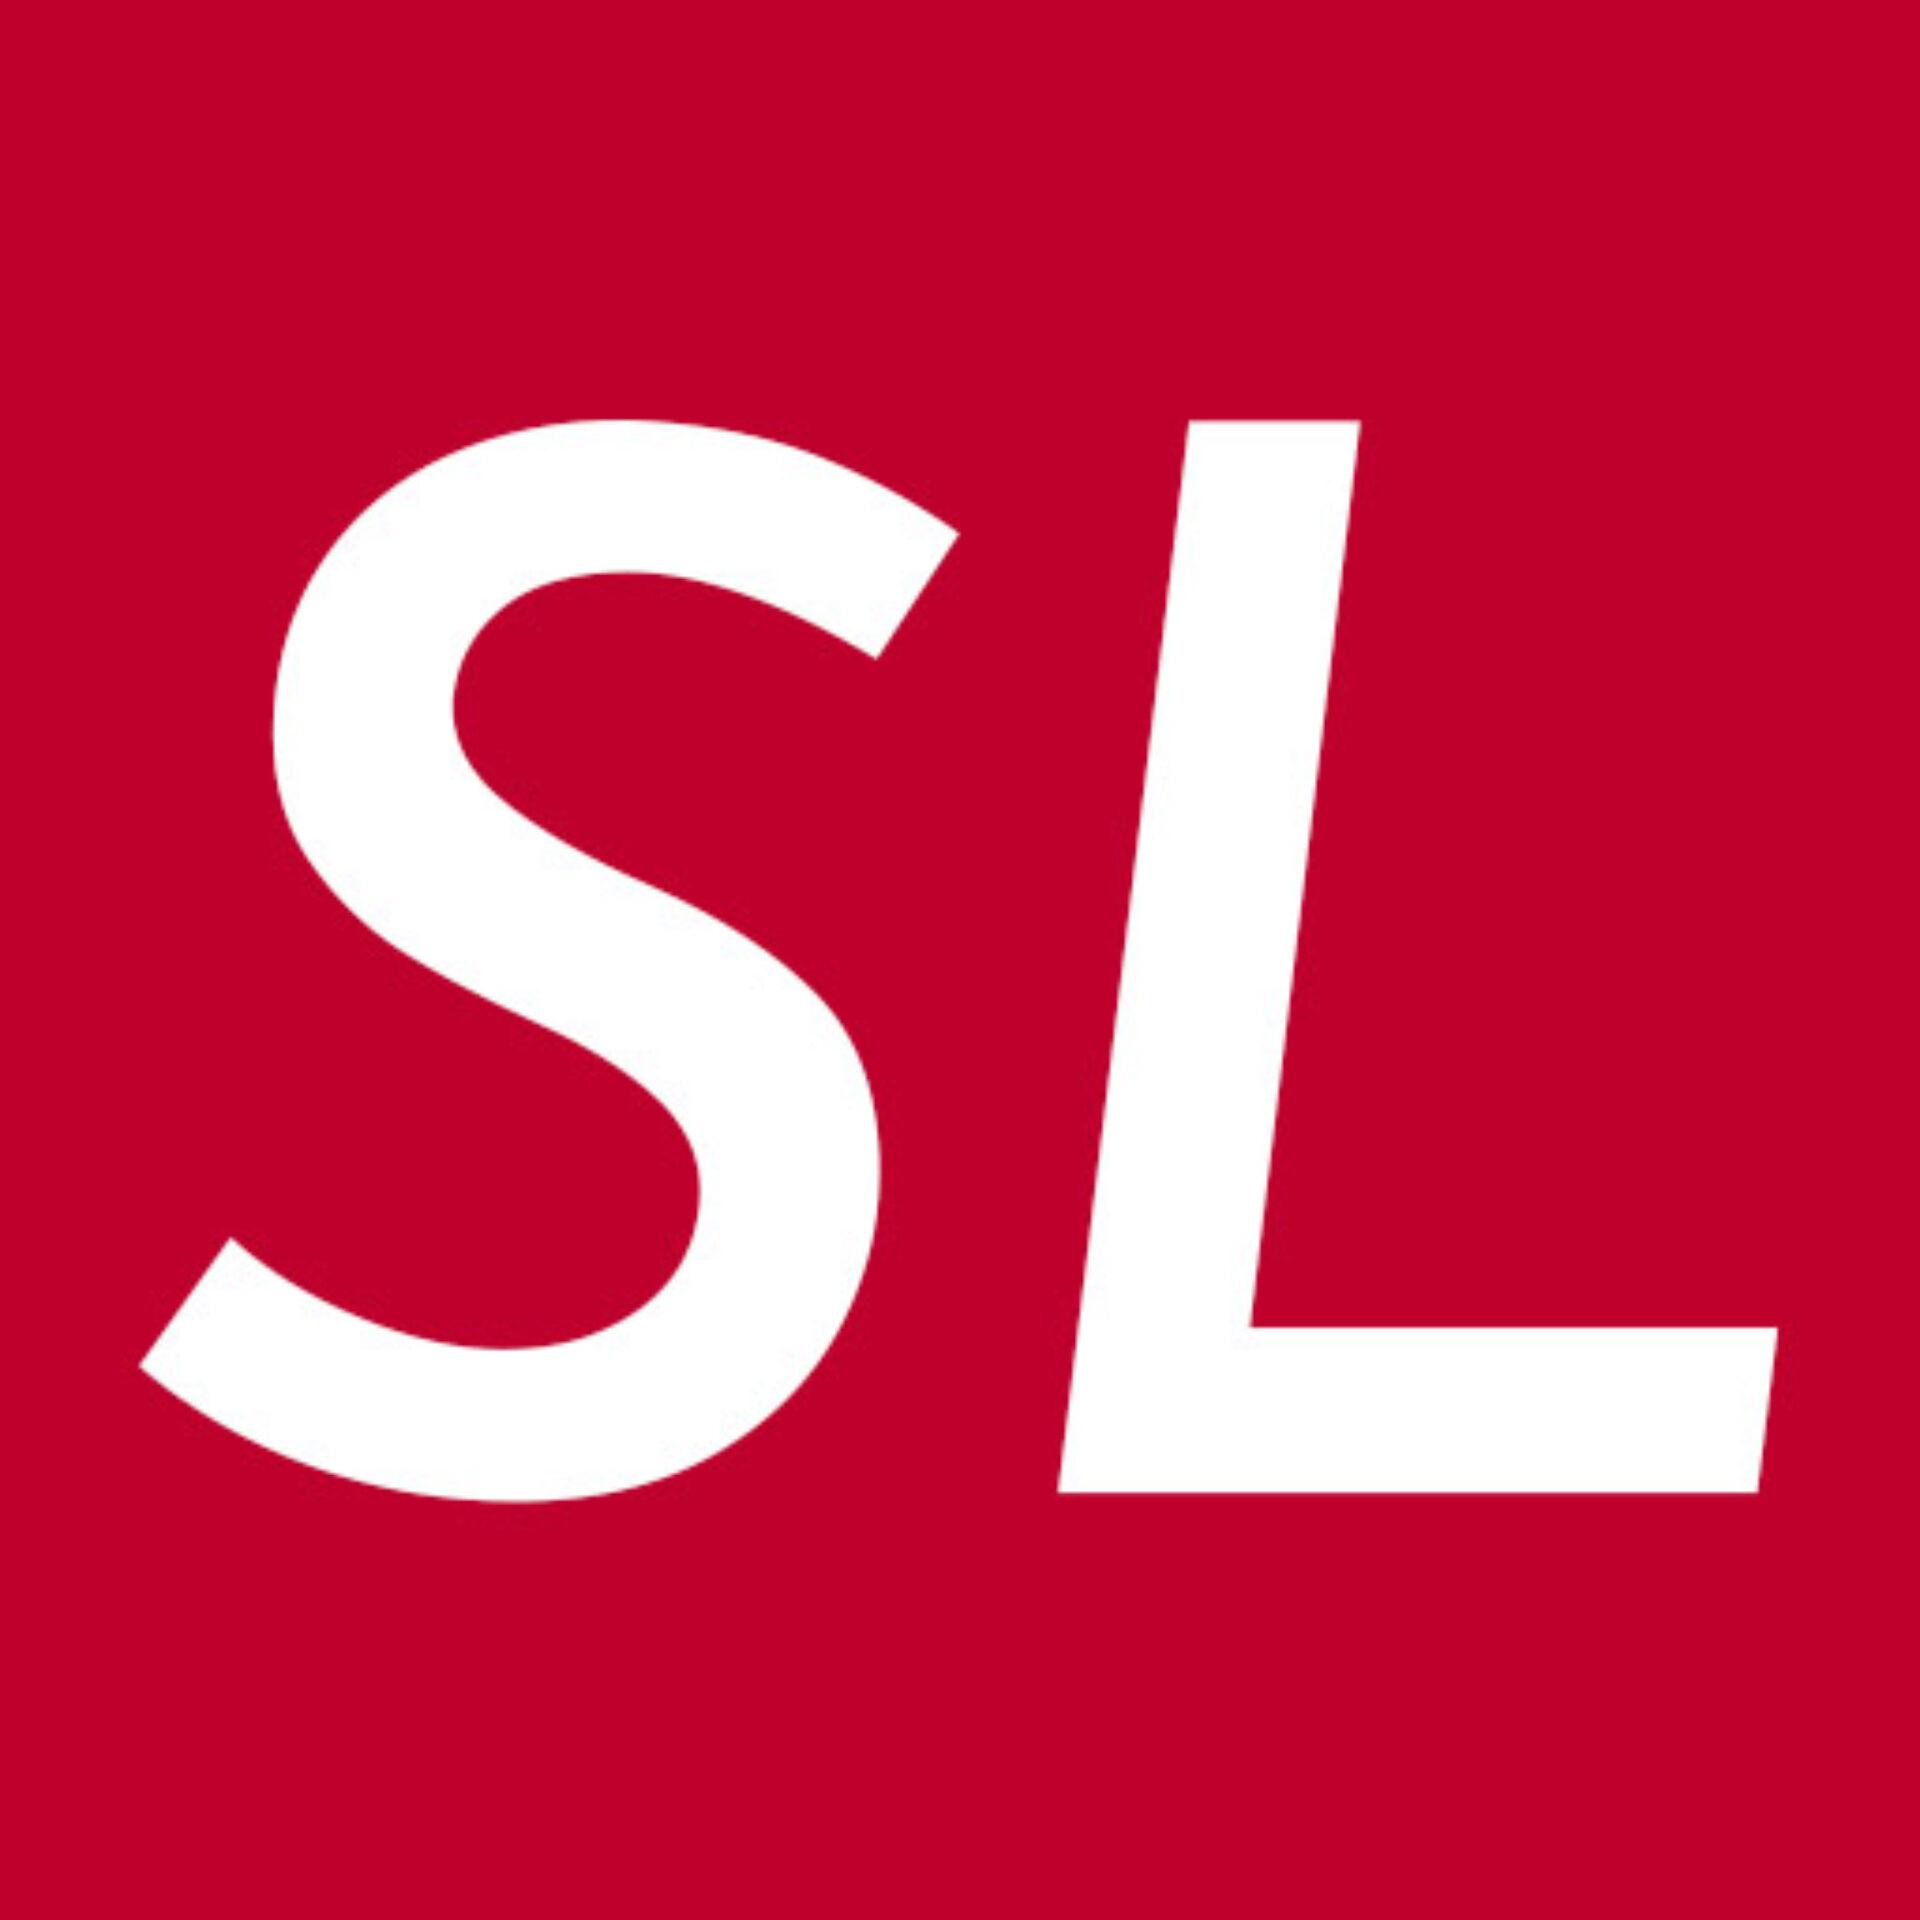 www.speedlink.com